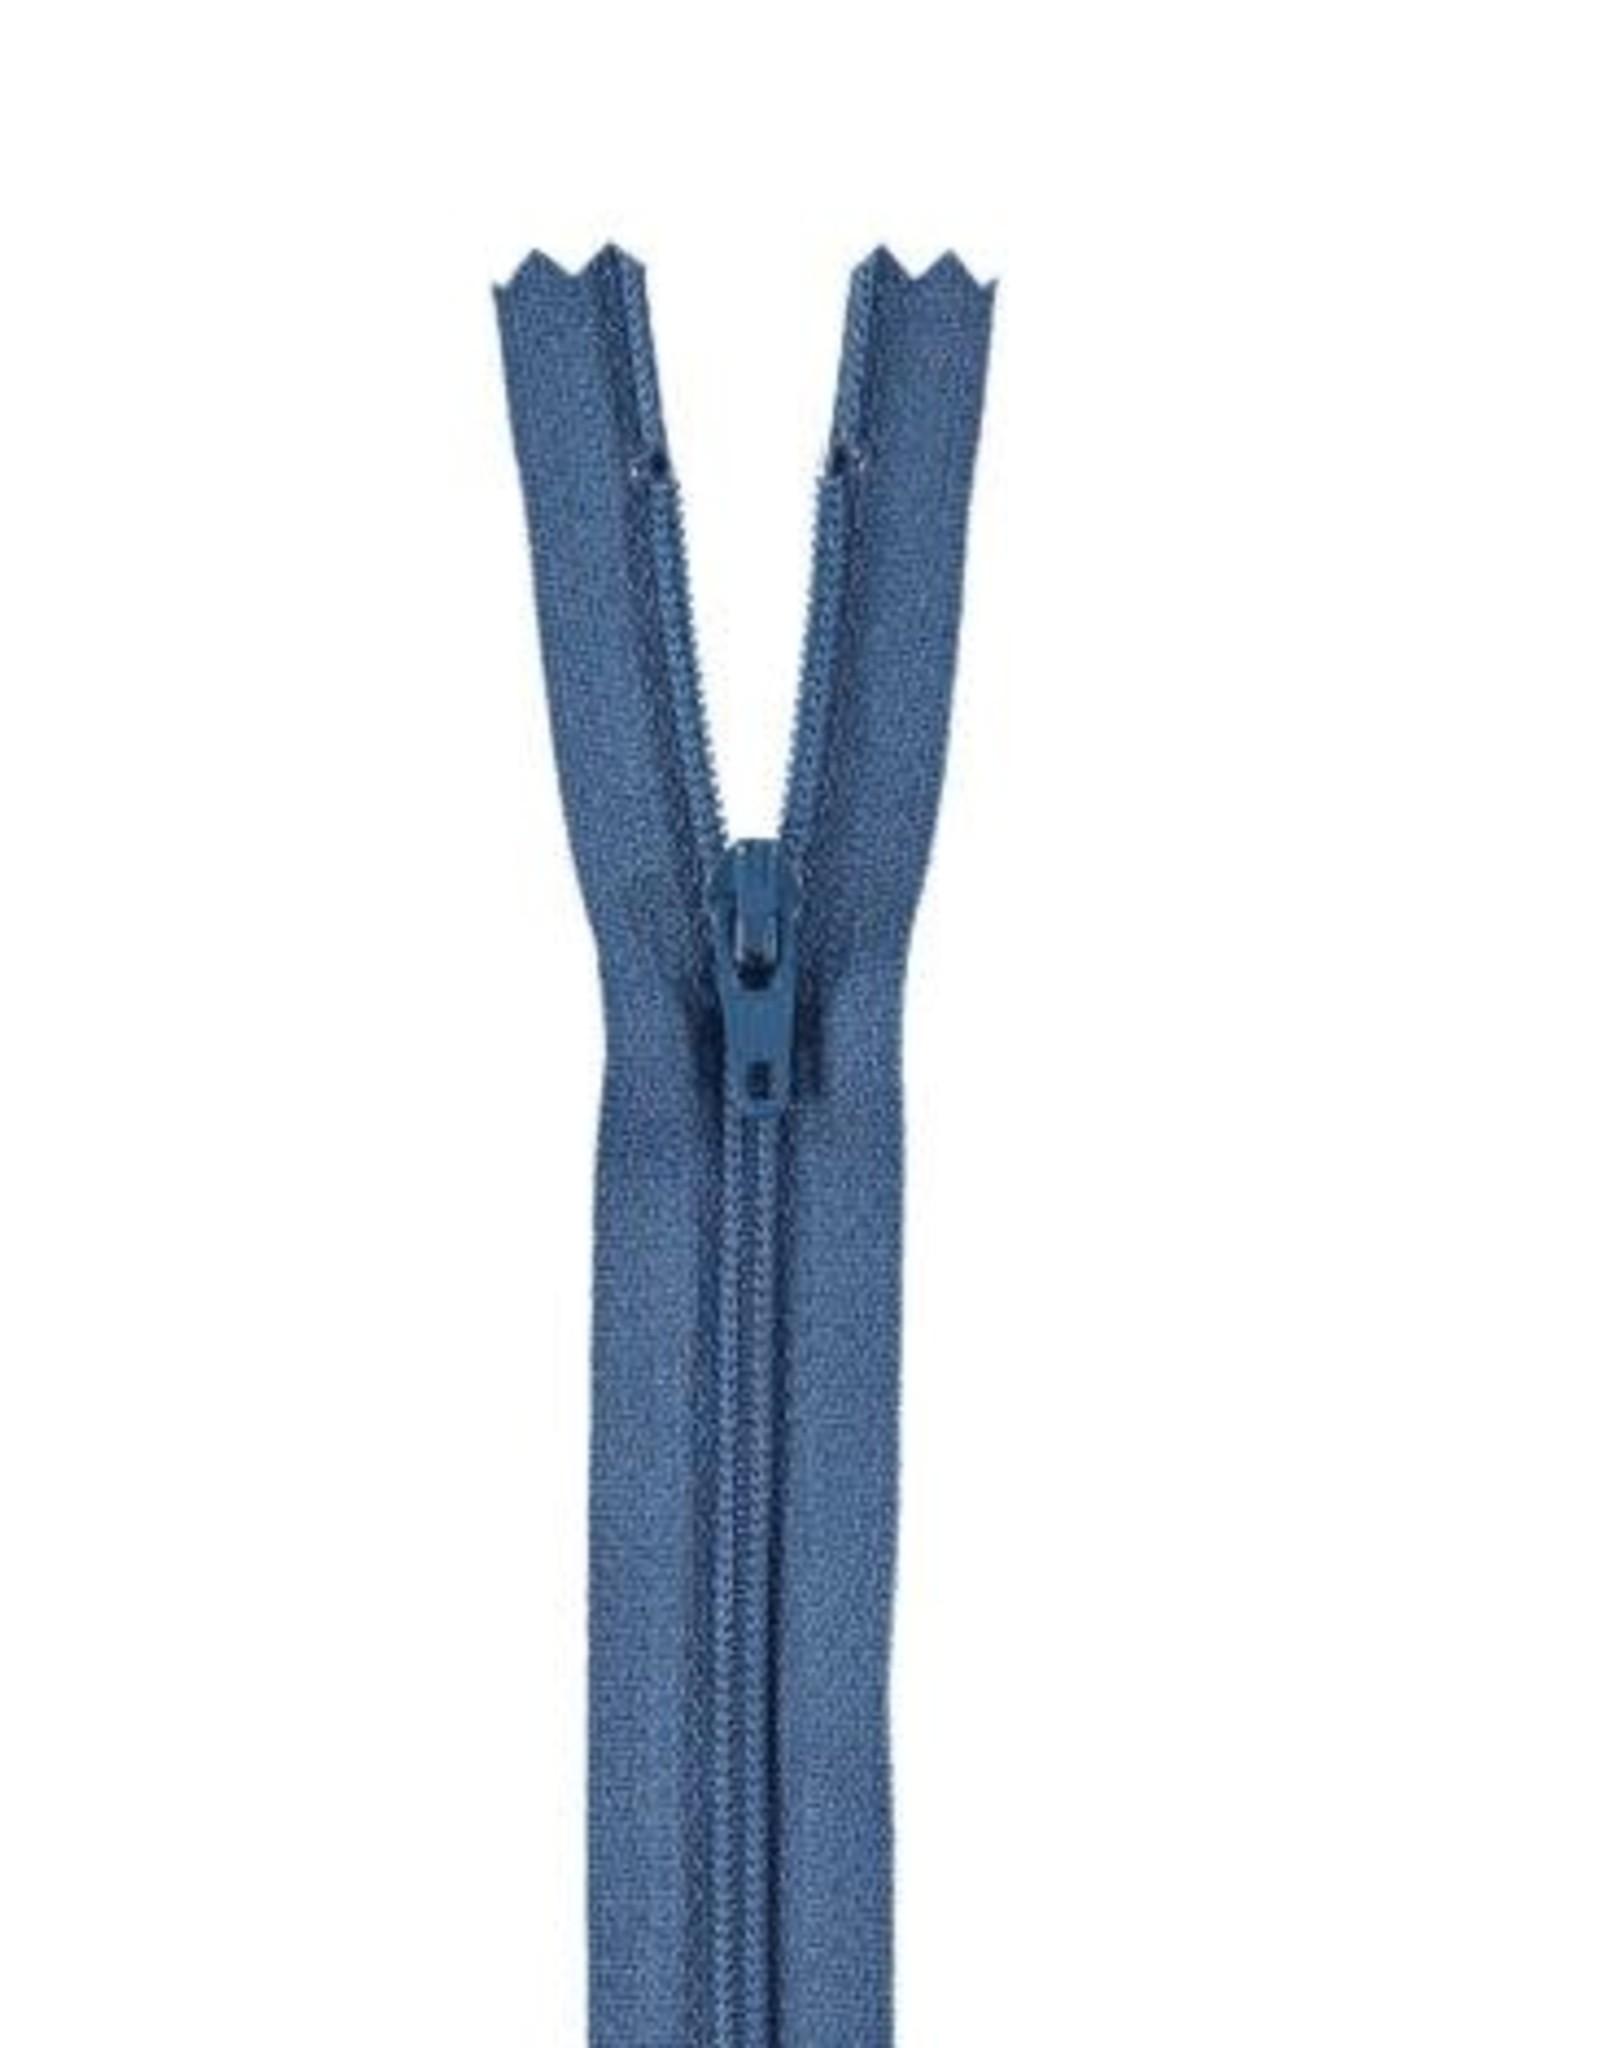 YKK Spiraalrits niet-DB 3mm jeansblauw 839-45cm